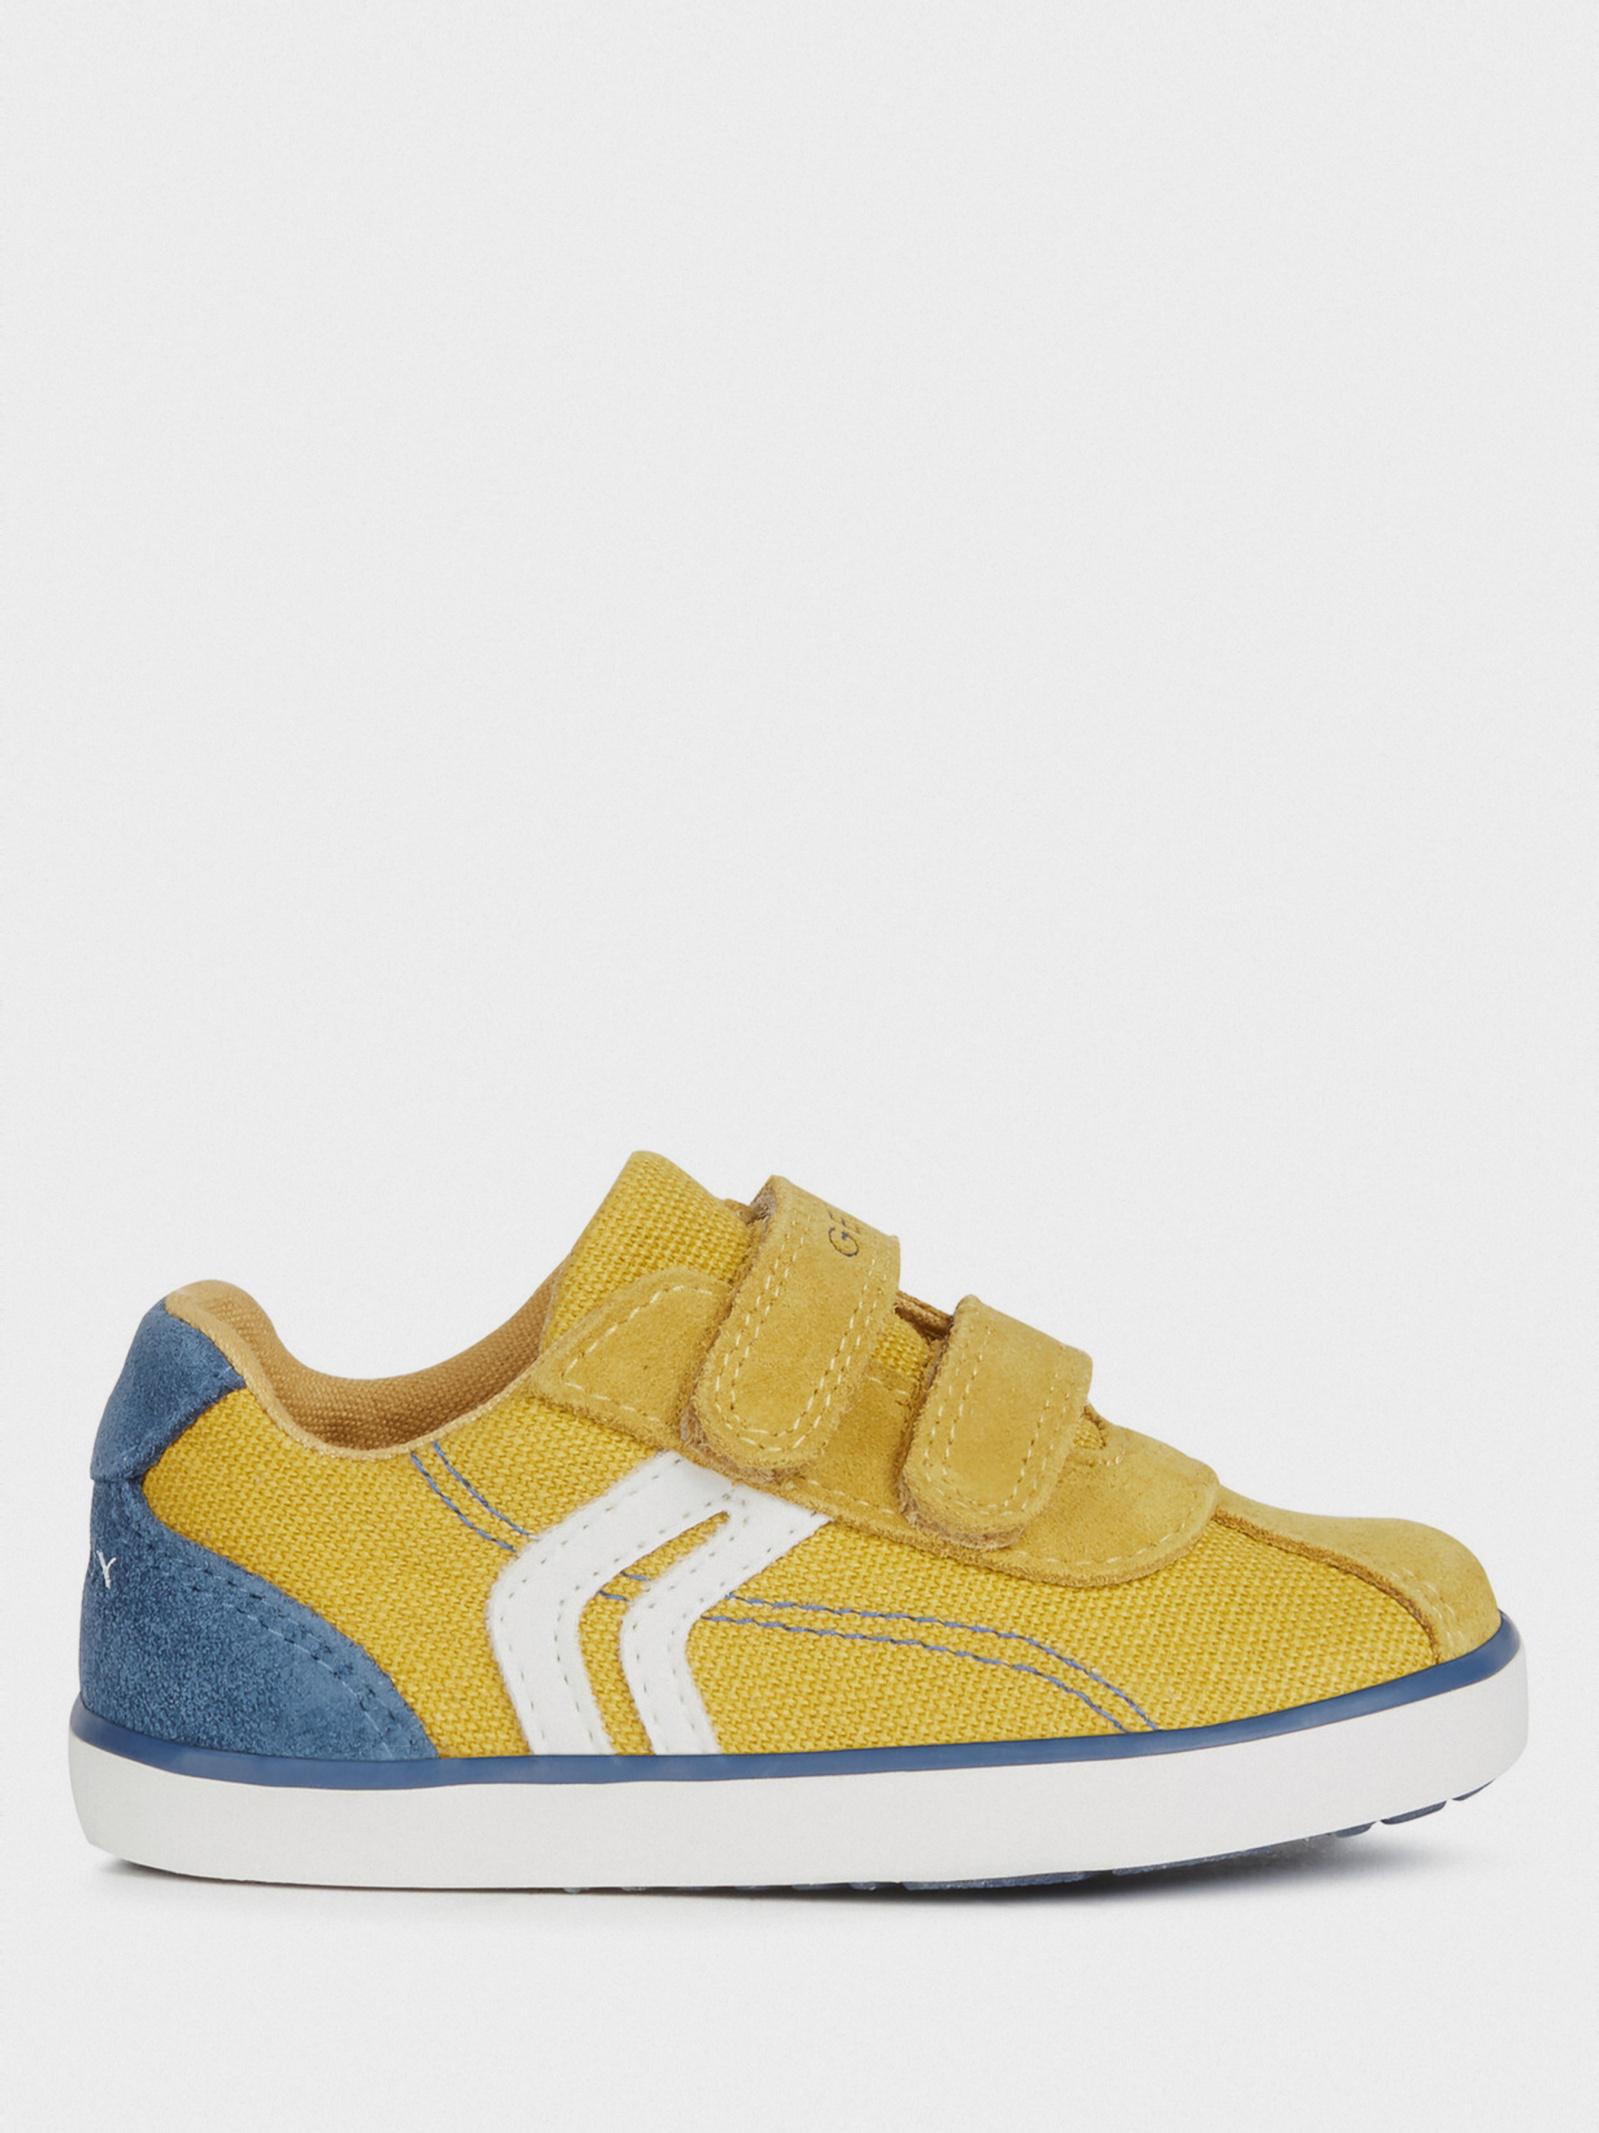 Полуботинки детские Geox B KILWI BOY B82A7G-01022-C2G4B модная обувь, 2017